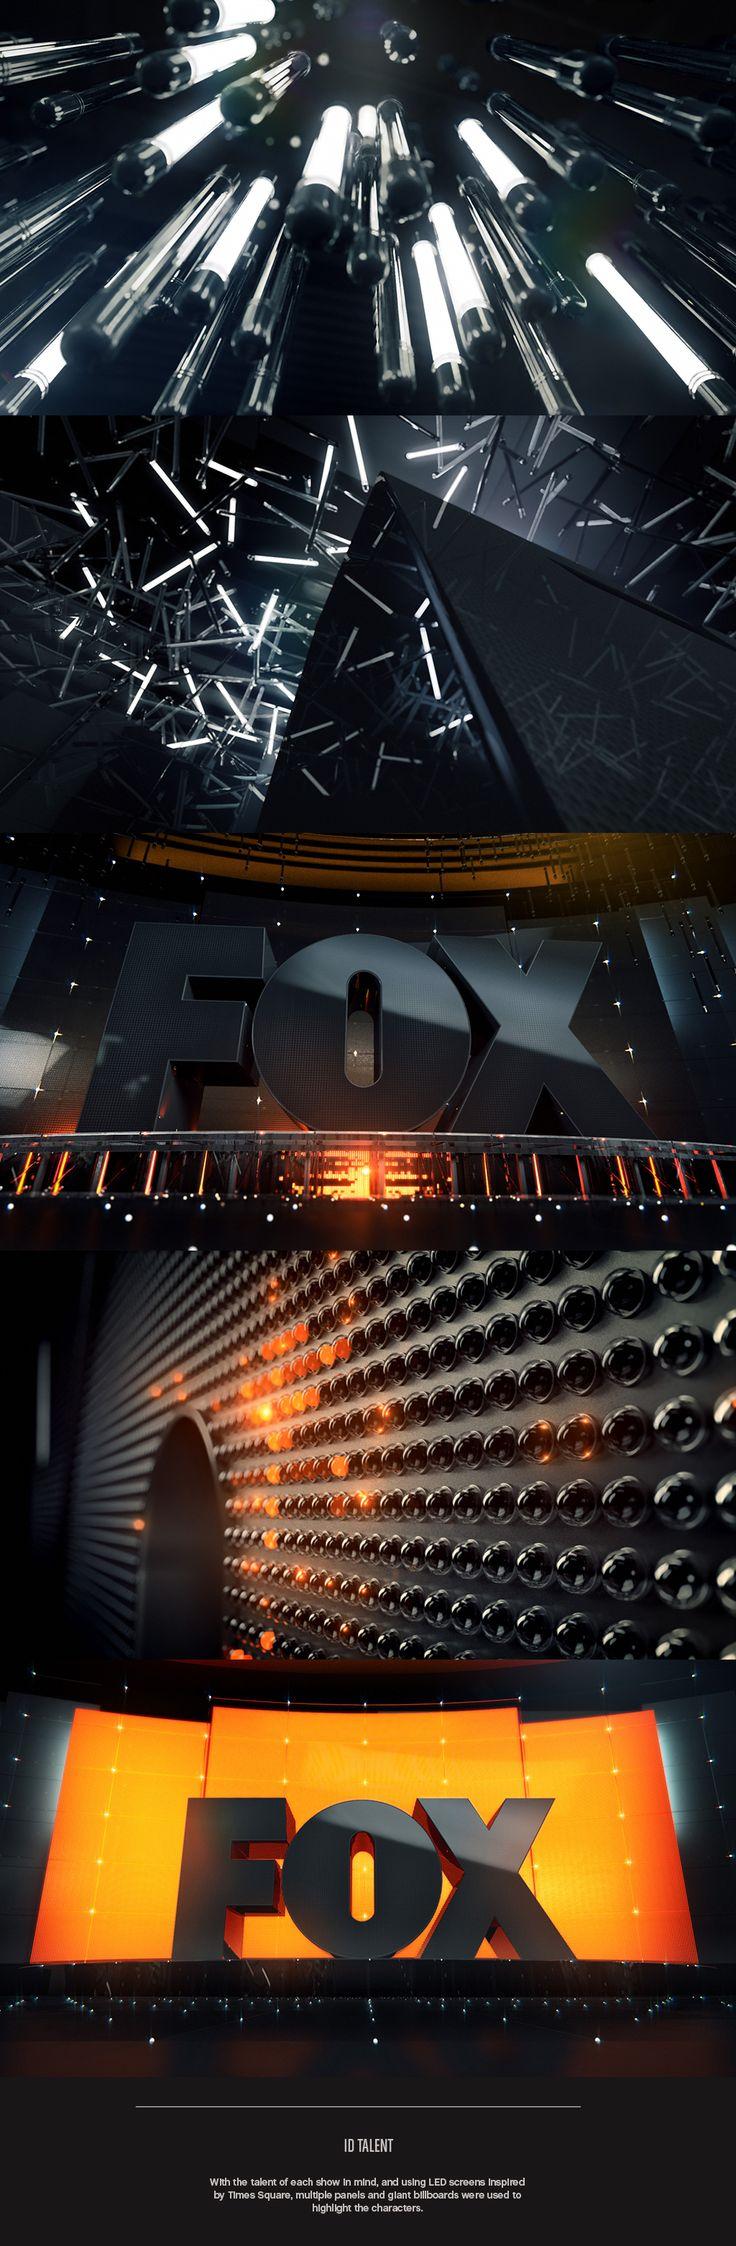 FOX Case Study | Superestudio - Animation & Design Company